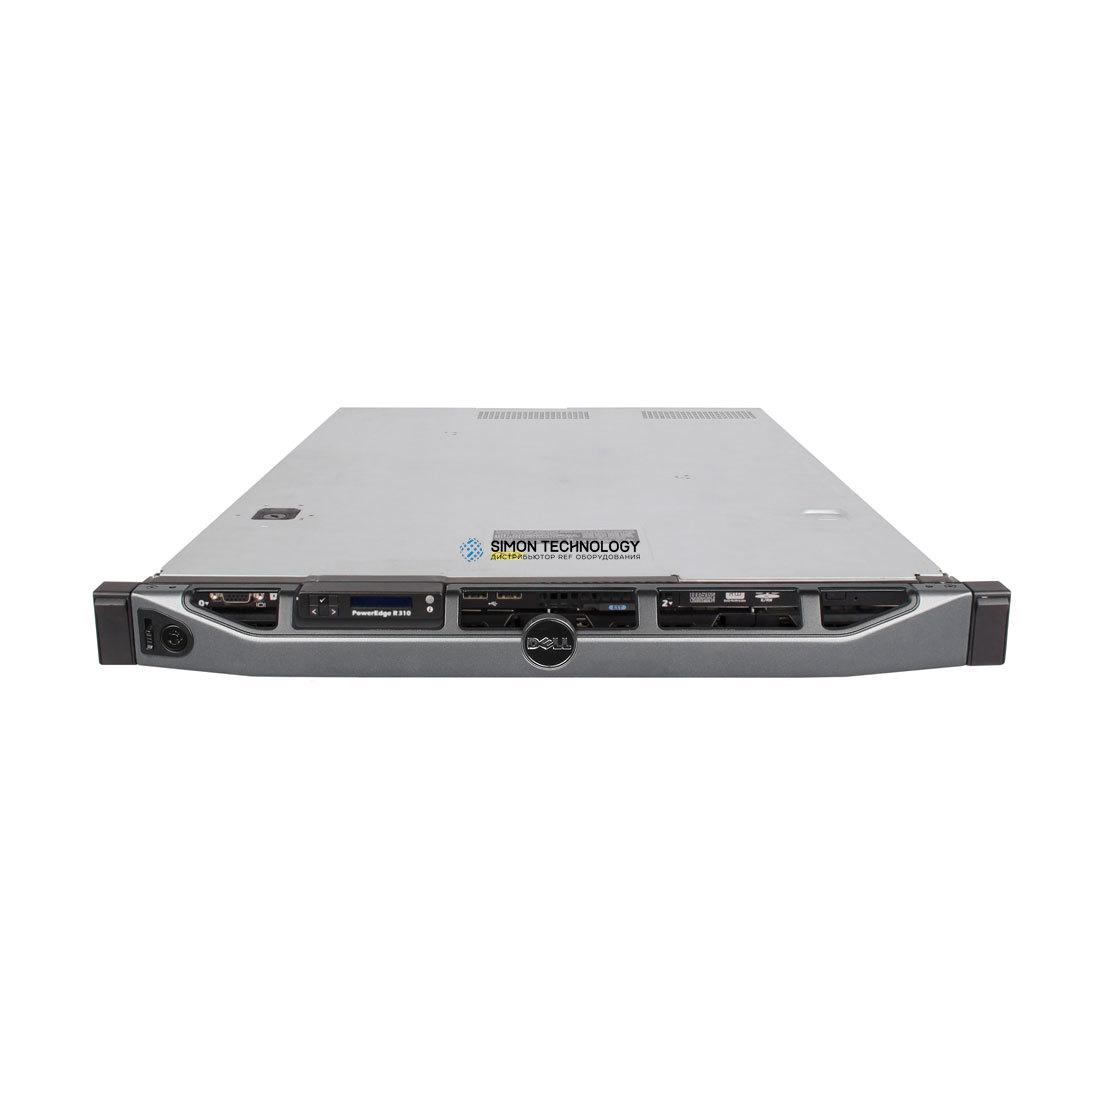 Сервер Dell R310 1*X3440 4GB H200 IDRAC6 4*LFF 2*SFF (PER310 X3440)